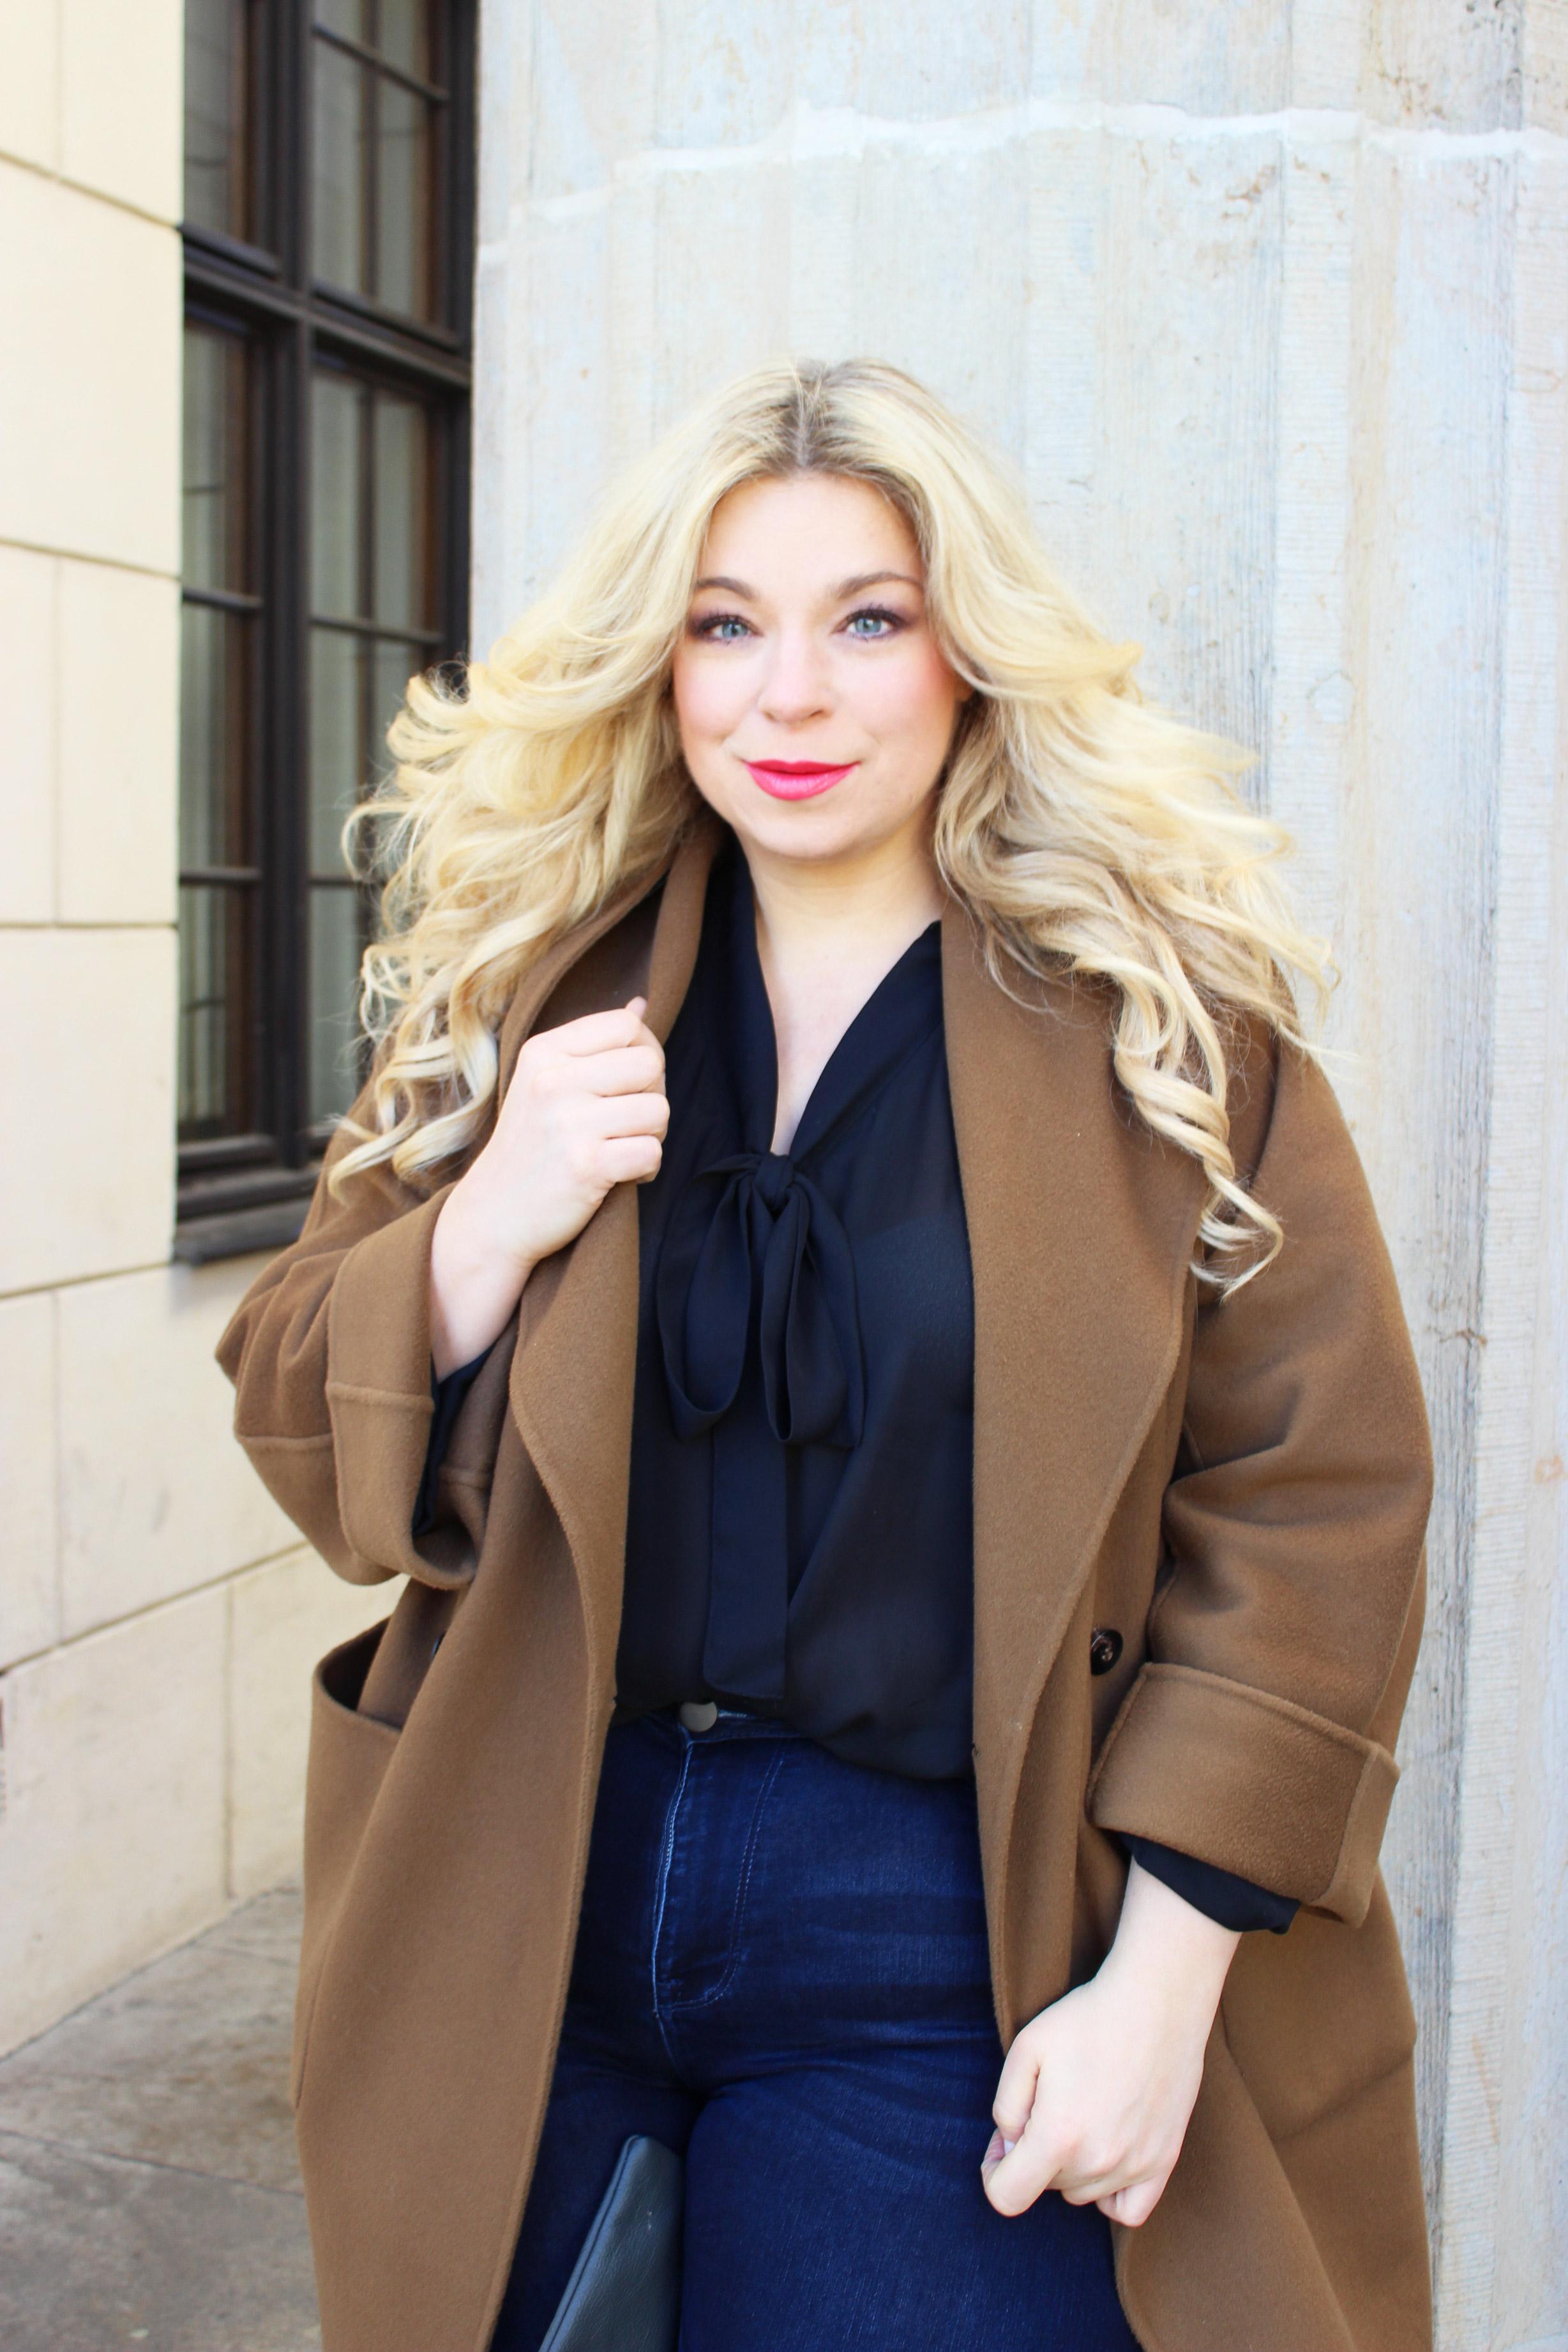 megabambi-caterina-plussize-curvy-Marina-rinaldi-outfit-blogger